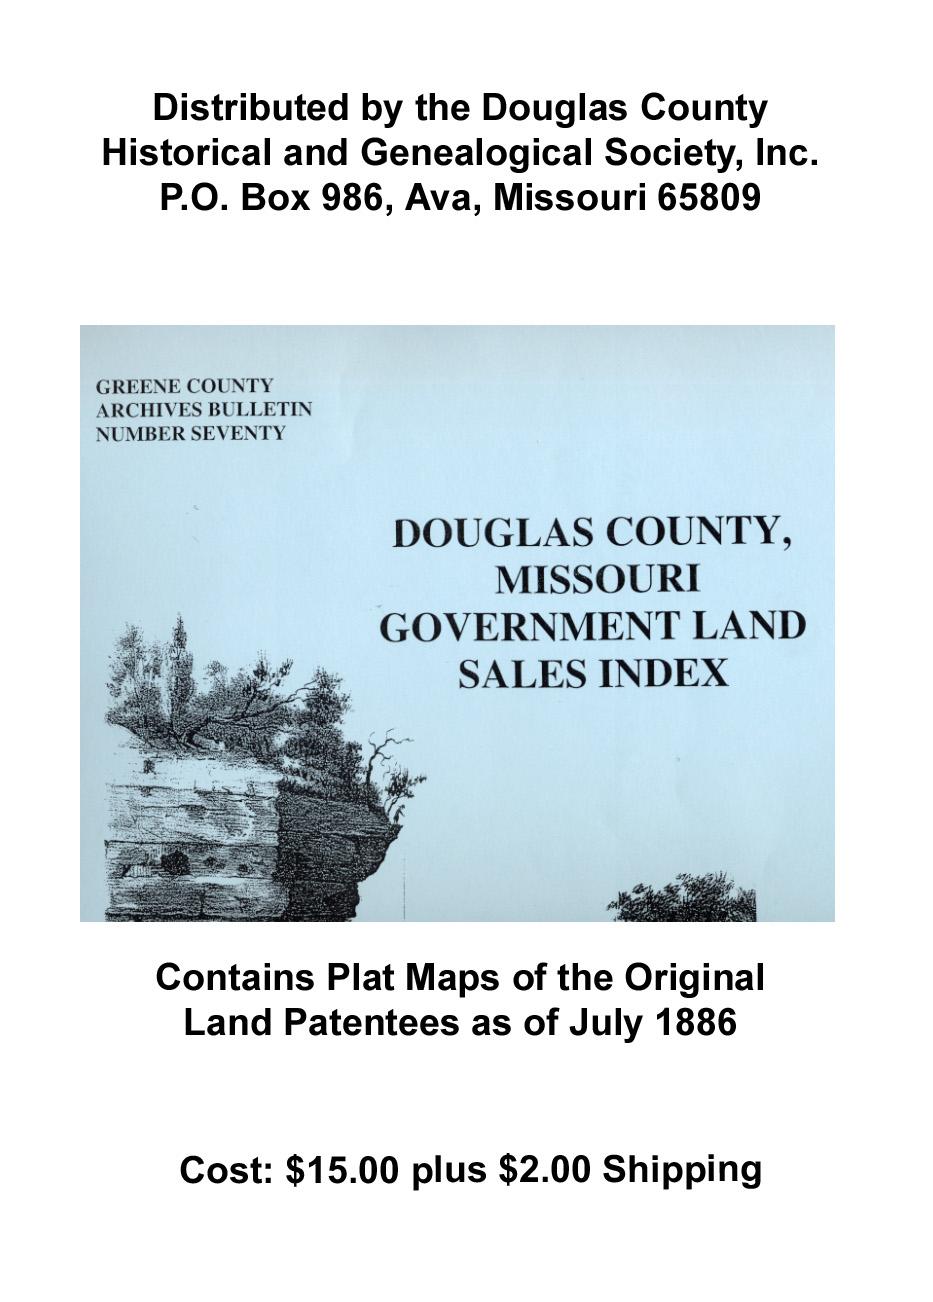 Douglas County GenWeb on douglas county colorado map, littleton plat map, douglas county mo gis mapping, douglas county mo map, douglas county wi land maps, douglas county parcel map, swift county mn map, douglas county soil map, ne county map, douglas az map, douglas county ne, douglas county survey maps, douglas county mn map, douglas county georgia map, douglas county plat book, portland plat map, douglas county nebraska, madison county ny map, douglas county road map, cass county nebraska map,